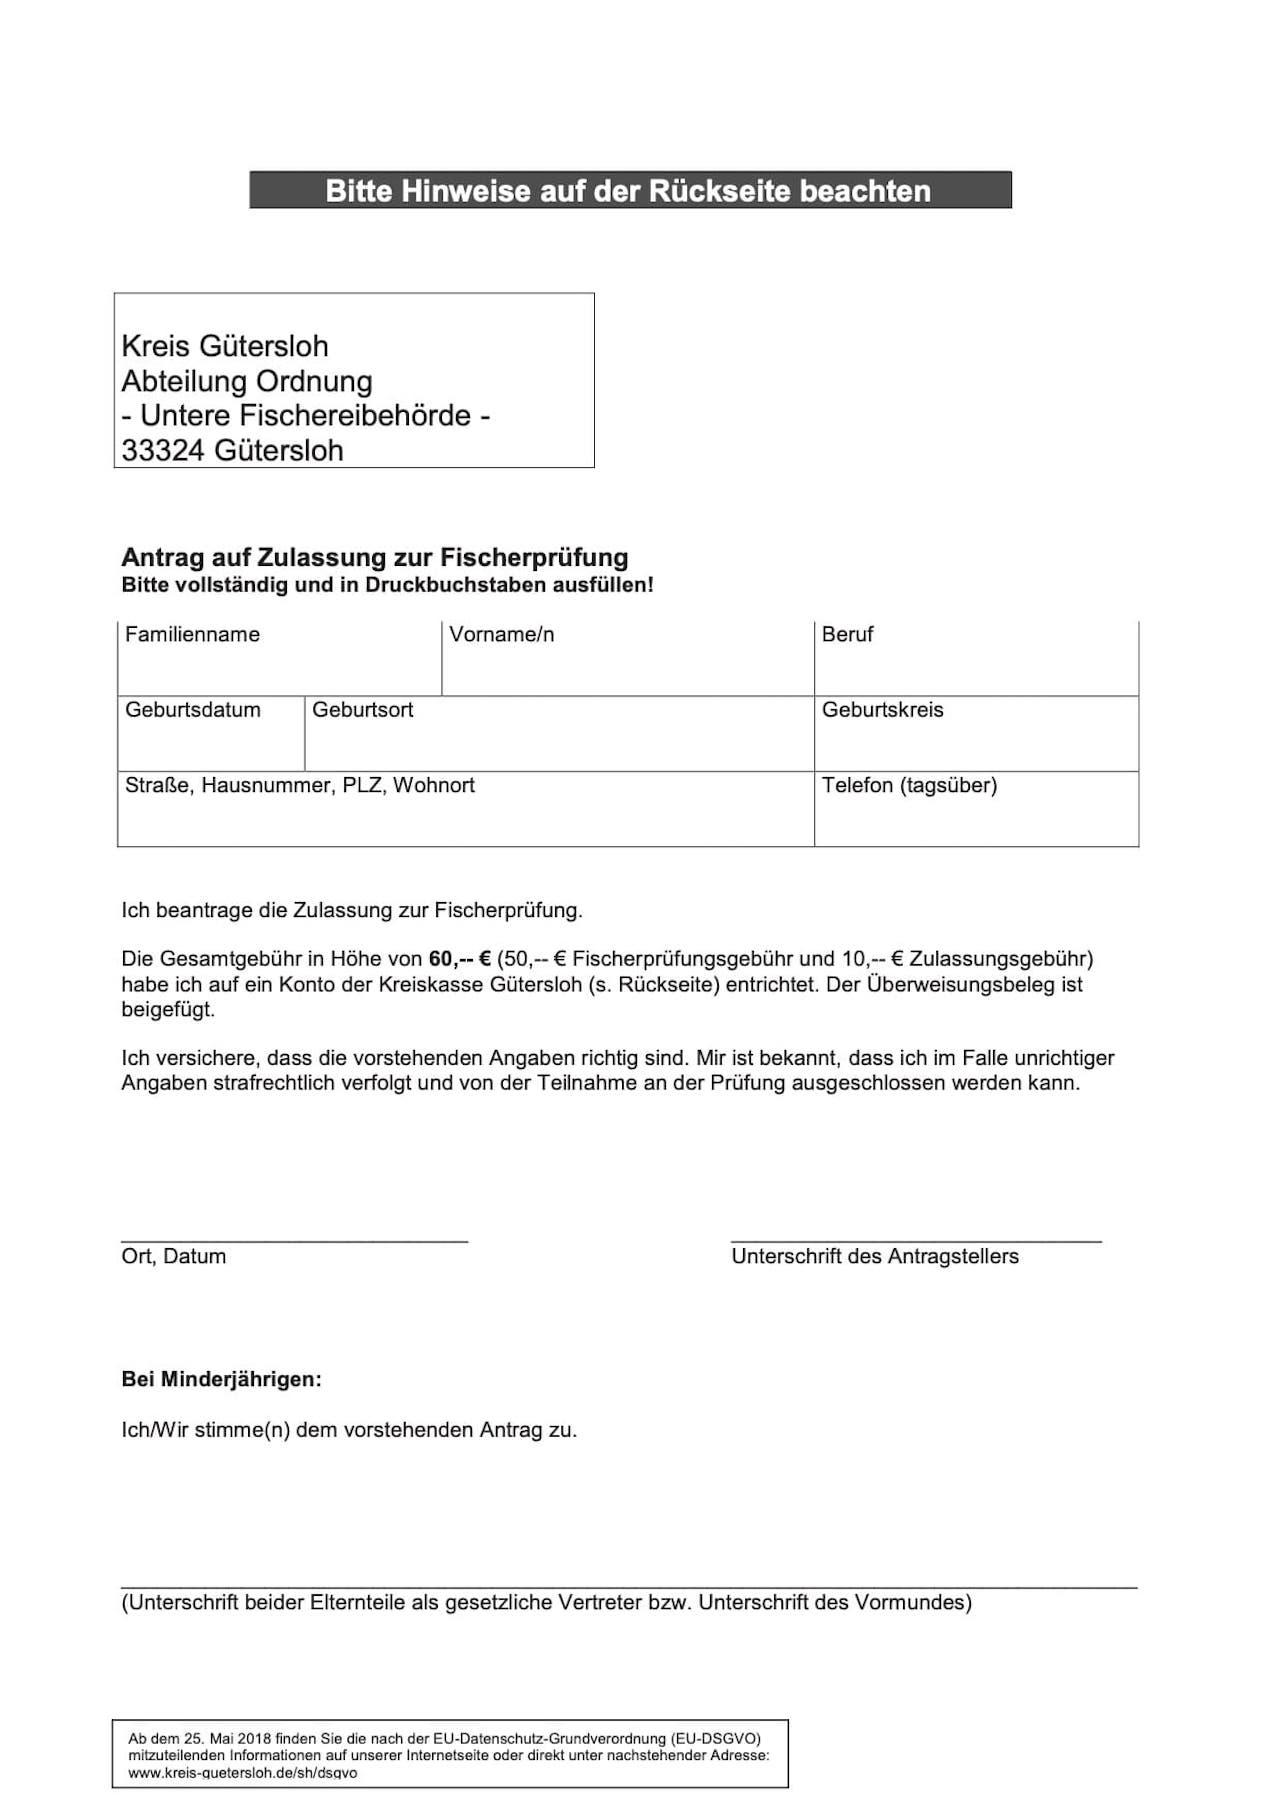 Fischerprüfung Gütersloh Antragsformular